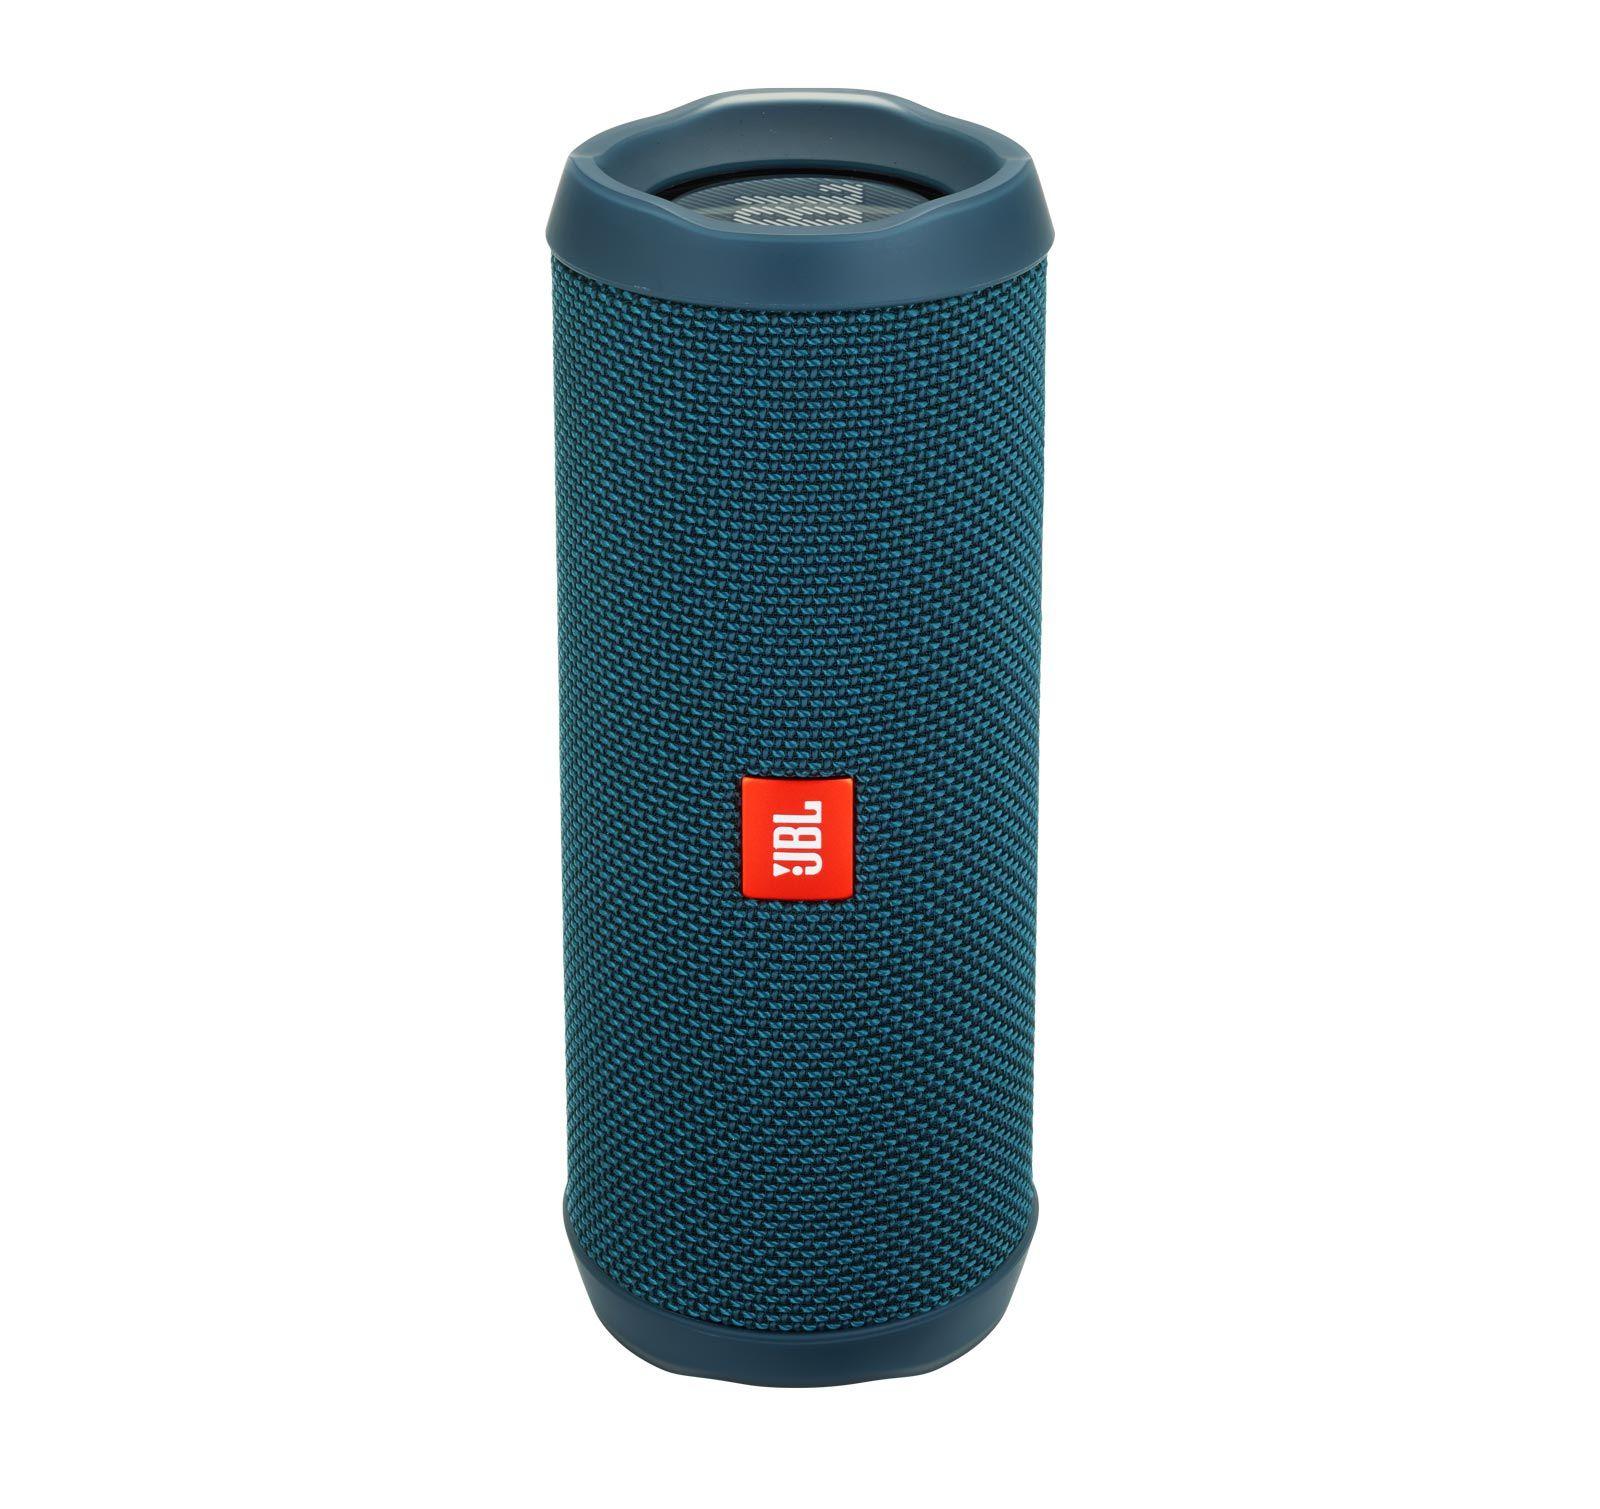 Jbl Flip 4 Ocean Blue Portable Bluetooth Speaker Ad Ocean Sponsored Flip Jbl Bluetooth Speakers Portable Bluetooth Speaker Waterproof Bluetooth Speaker